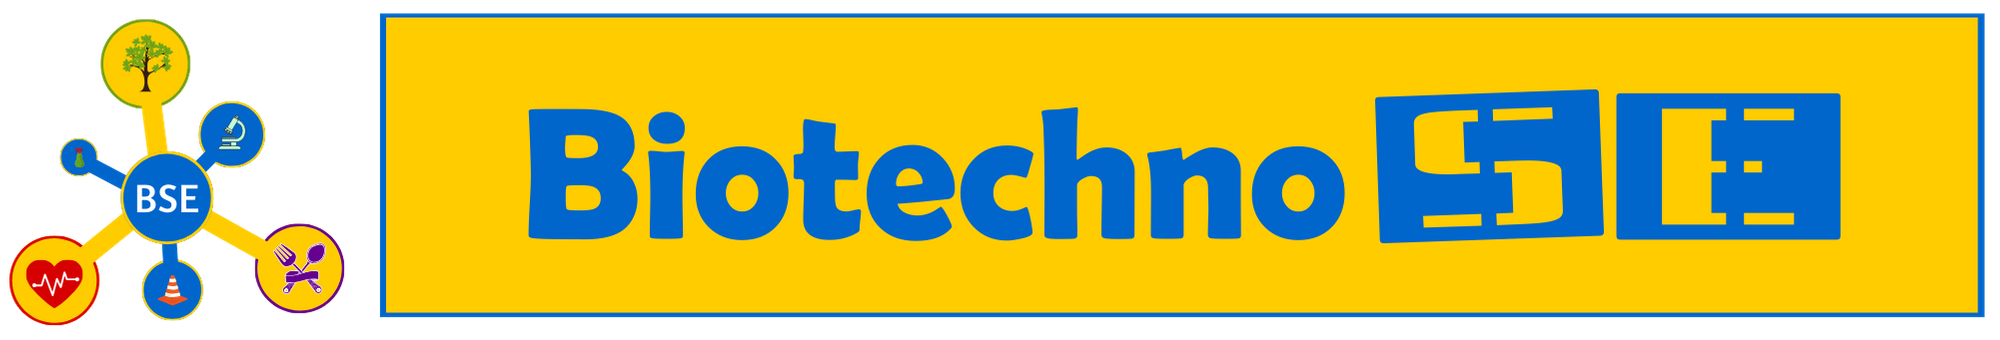 Biotechnose, association de professeurs de Biotechnologies